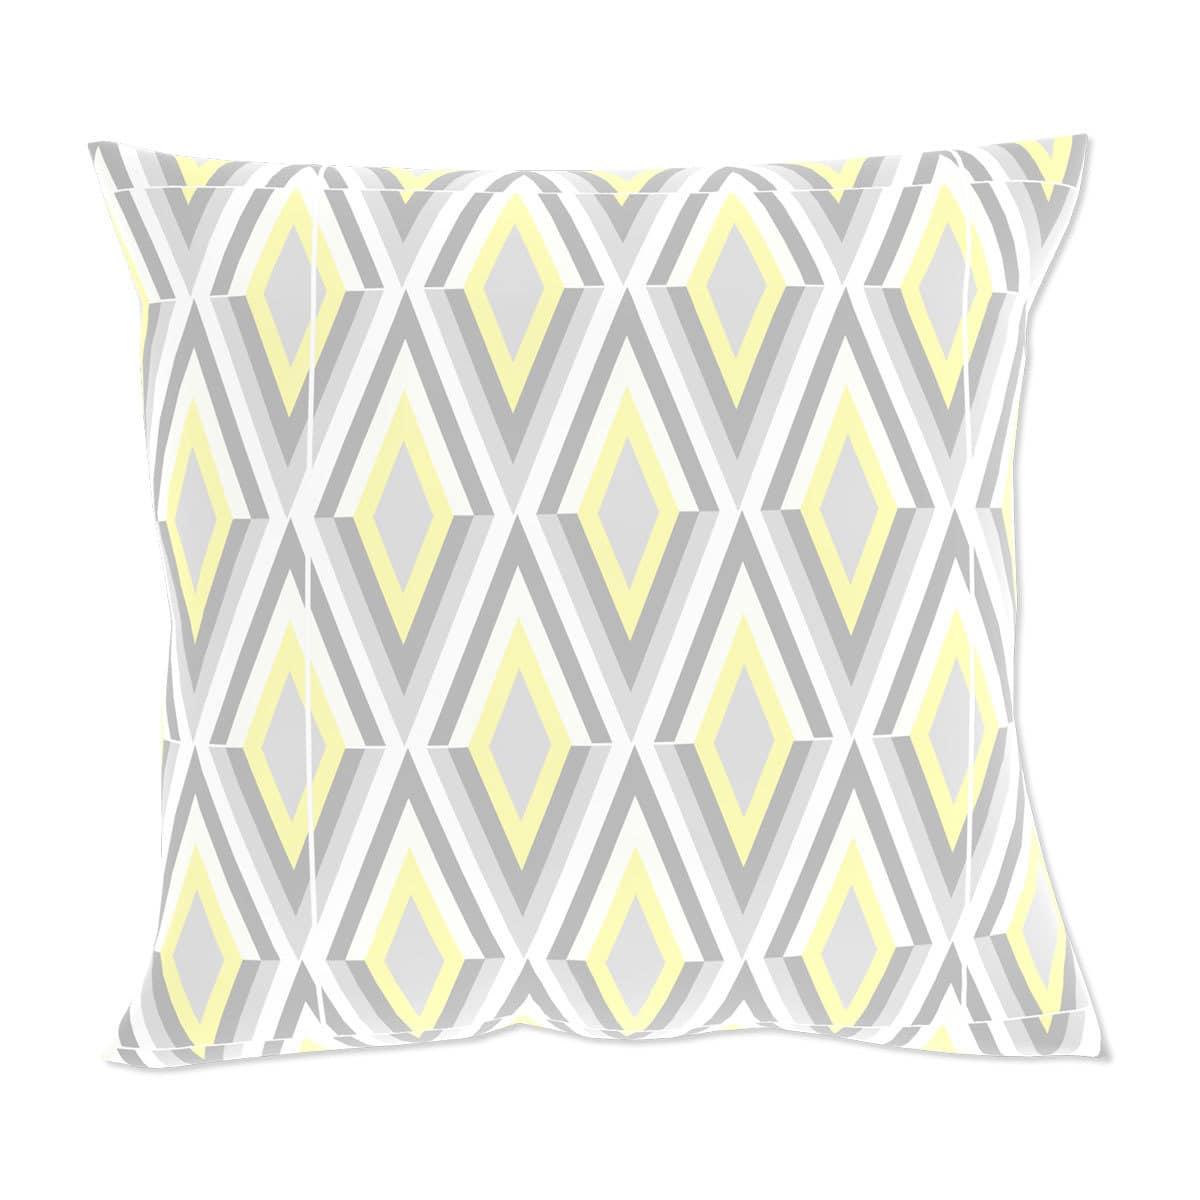 living dreams kissenh lle raute gelb grau conceptform gmbh. Black Bedroom Furniture Sets. Home Design Ideas